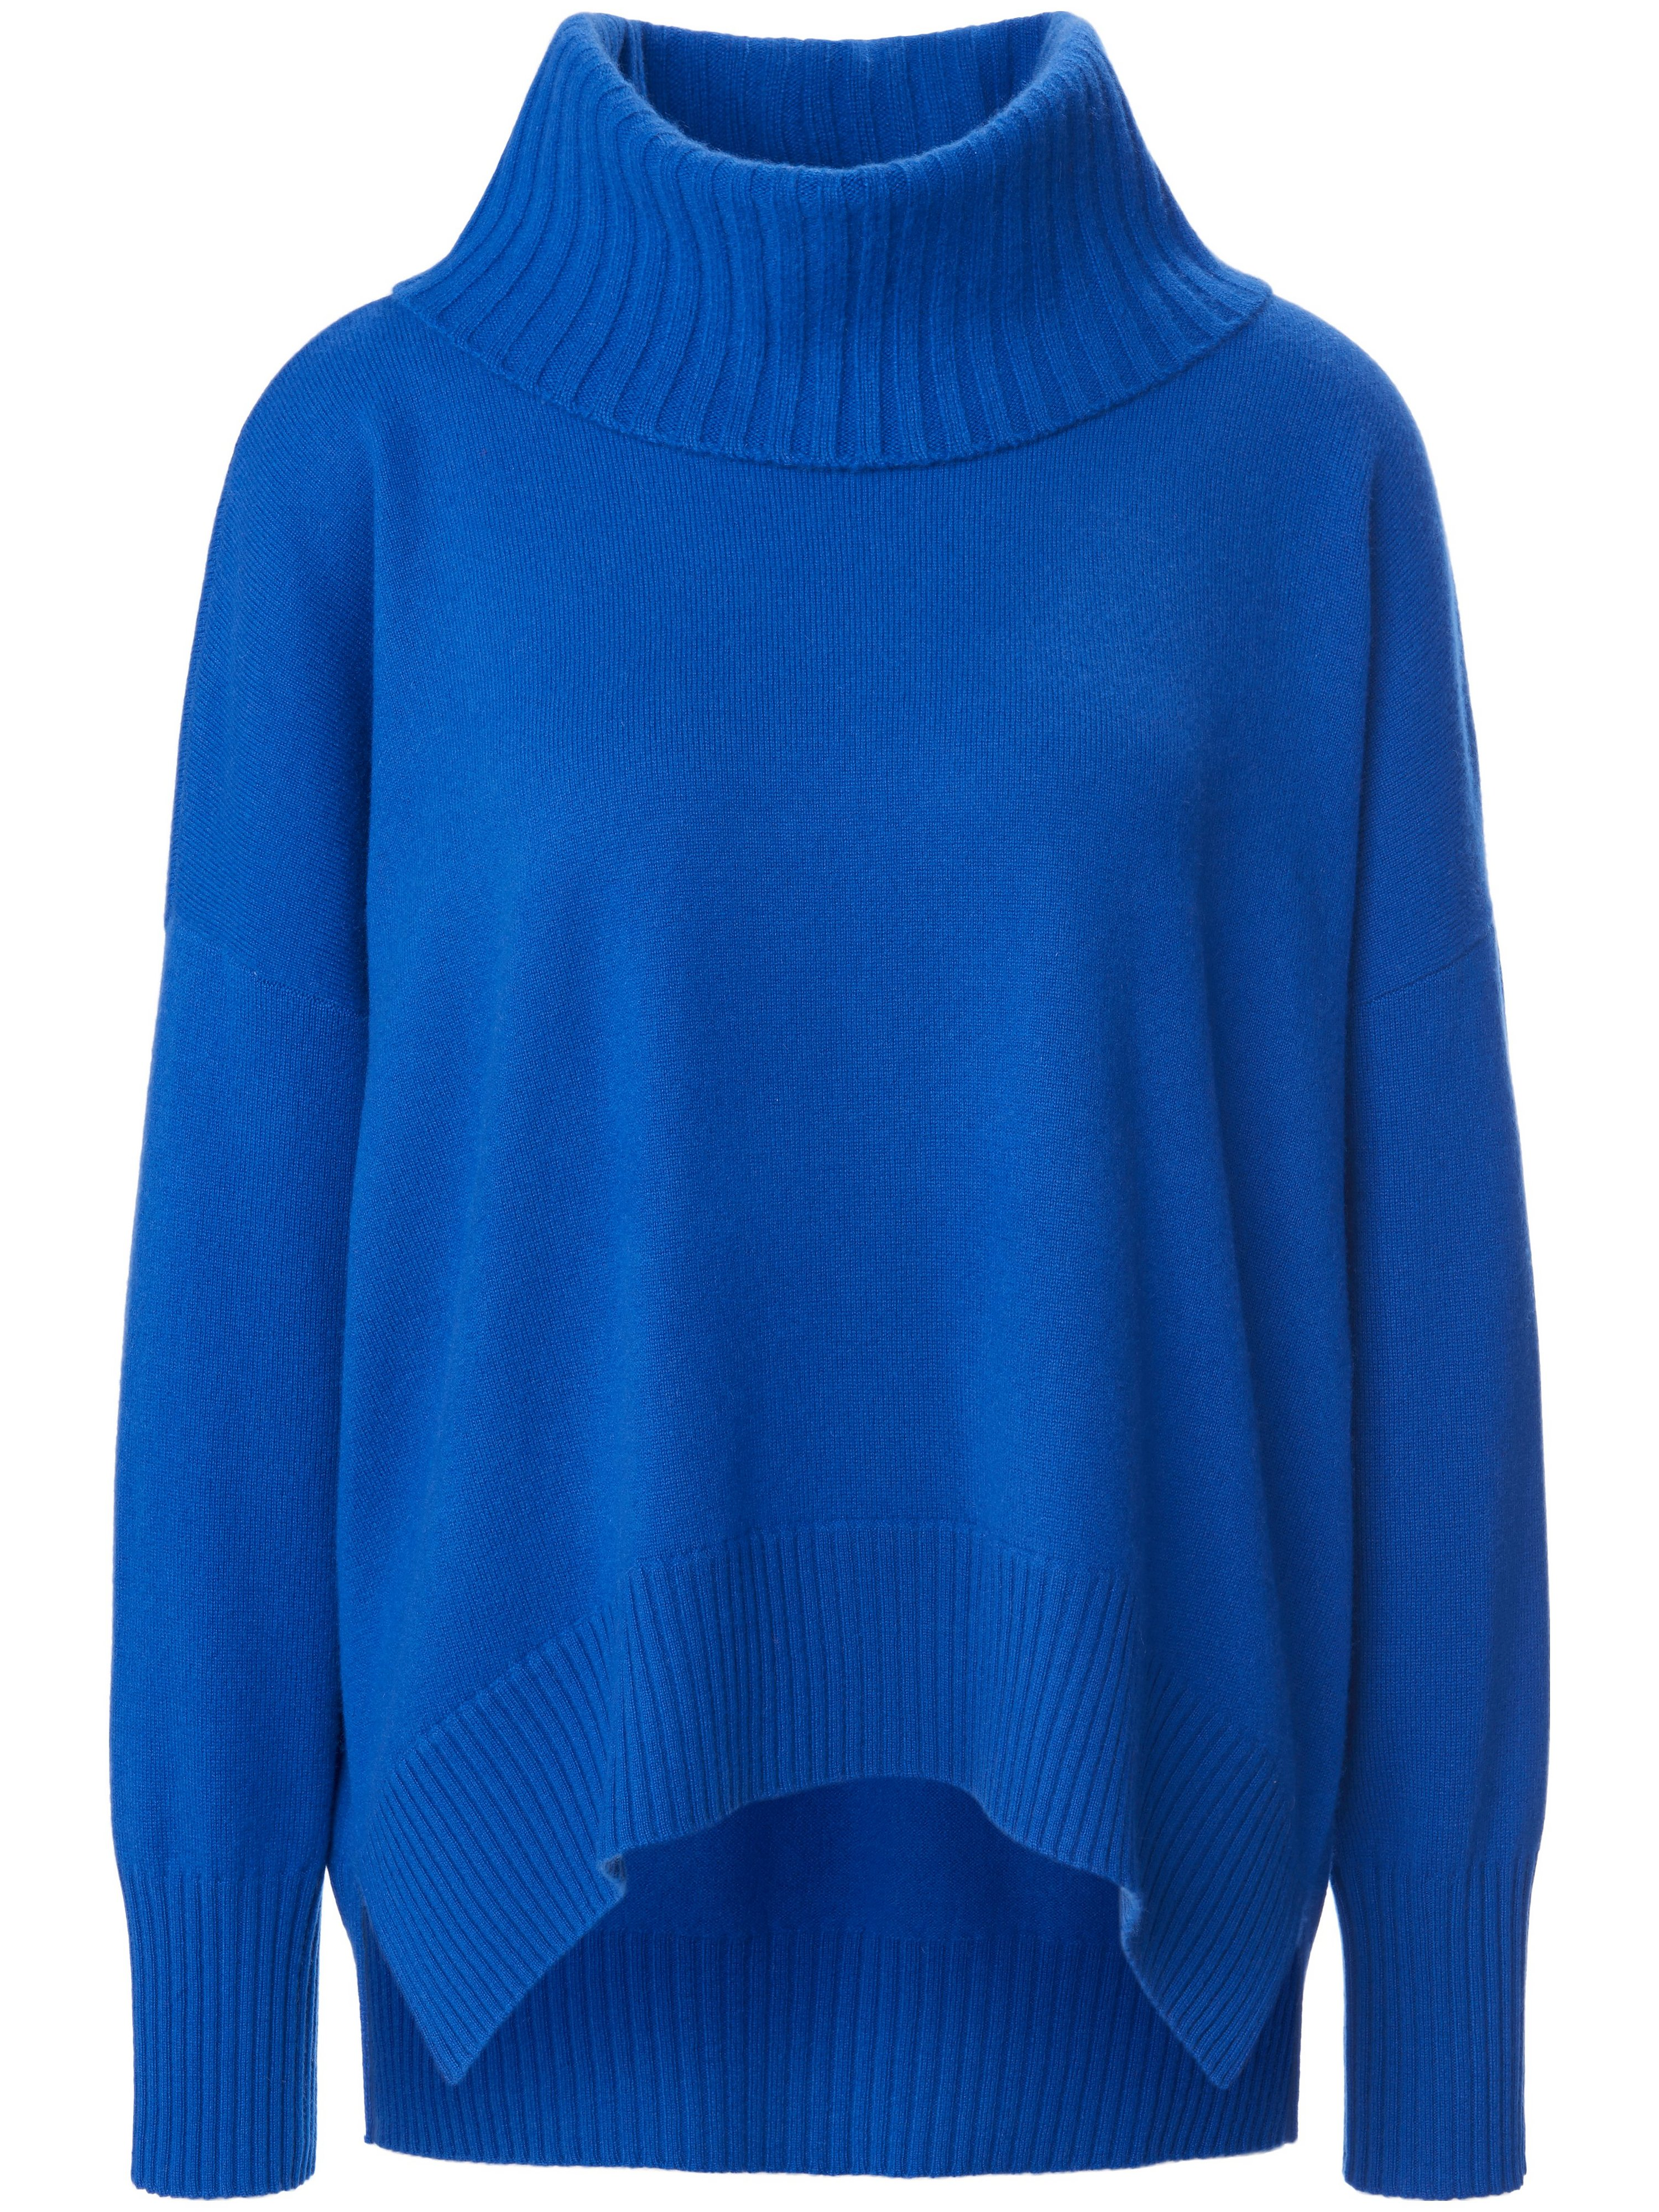 Le pull laine vierge et cachemire  include bleu taille 38